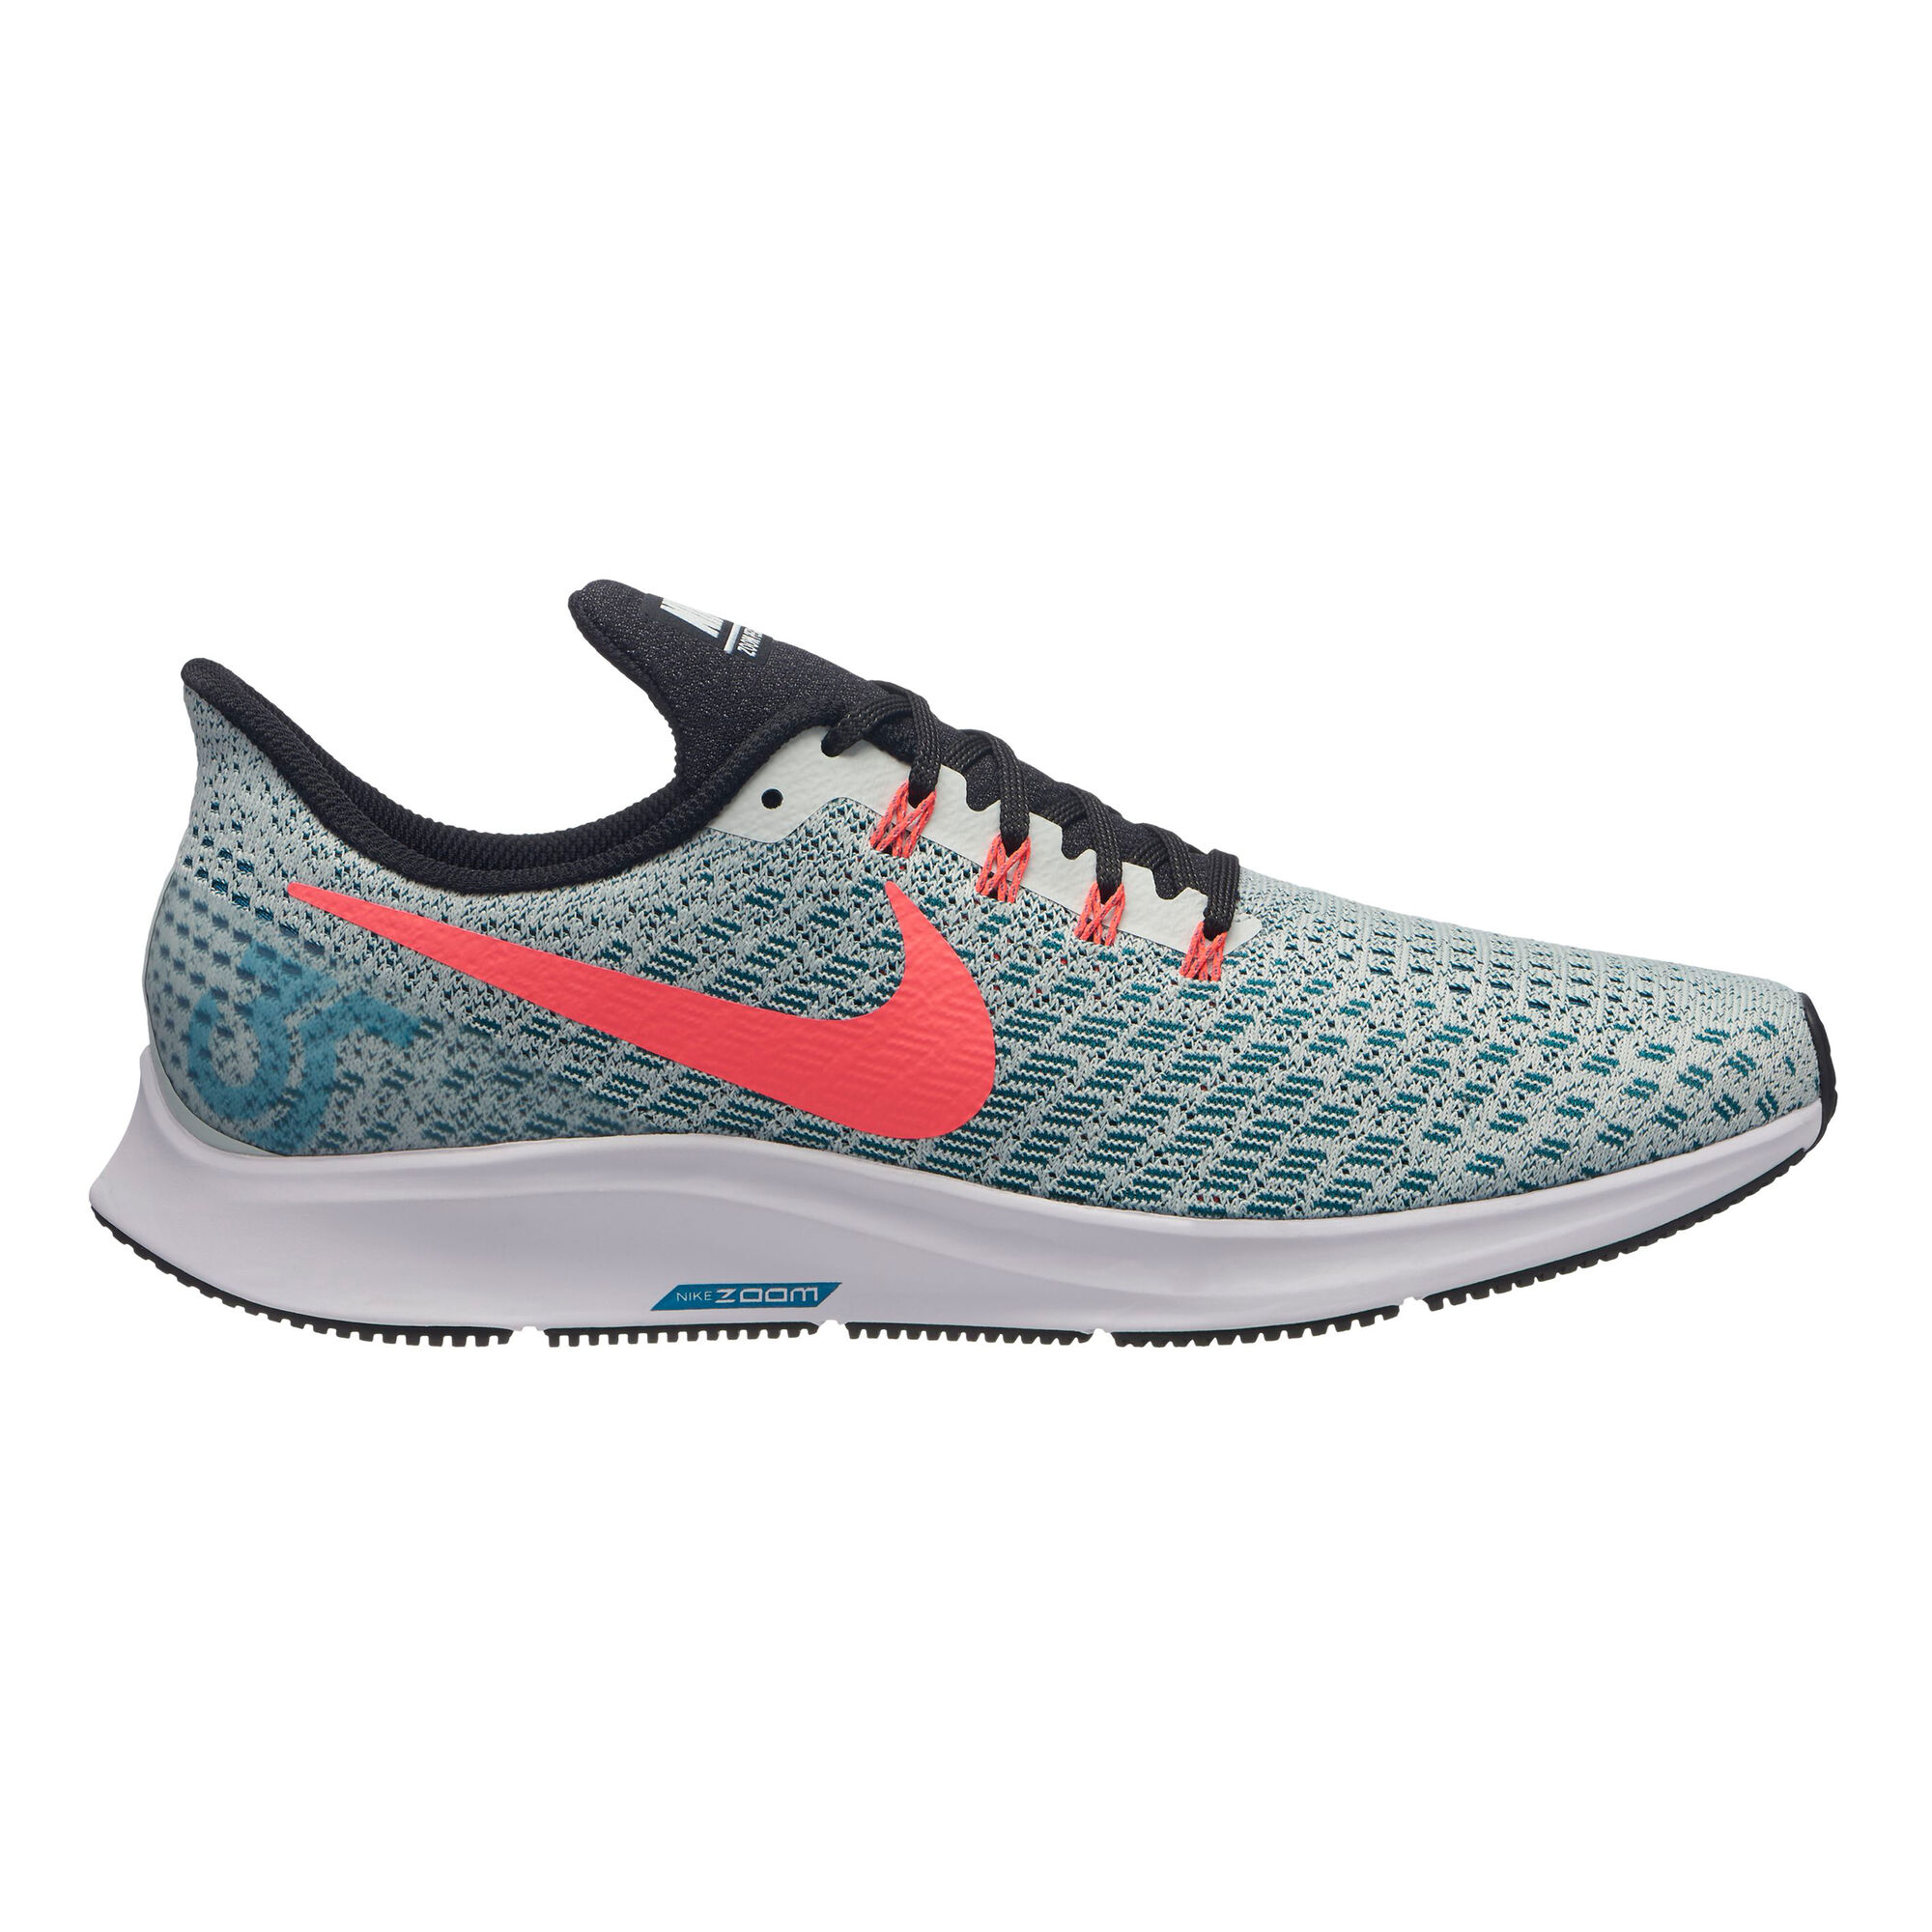 bc931fef5b739 buy Nike Air Zoom Pegasus 35 Neutral Running Shoe Men - Grey